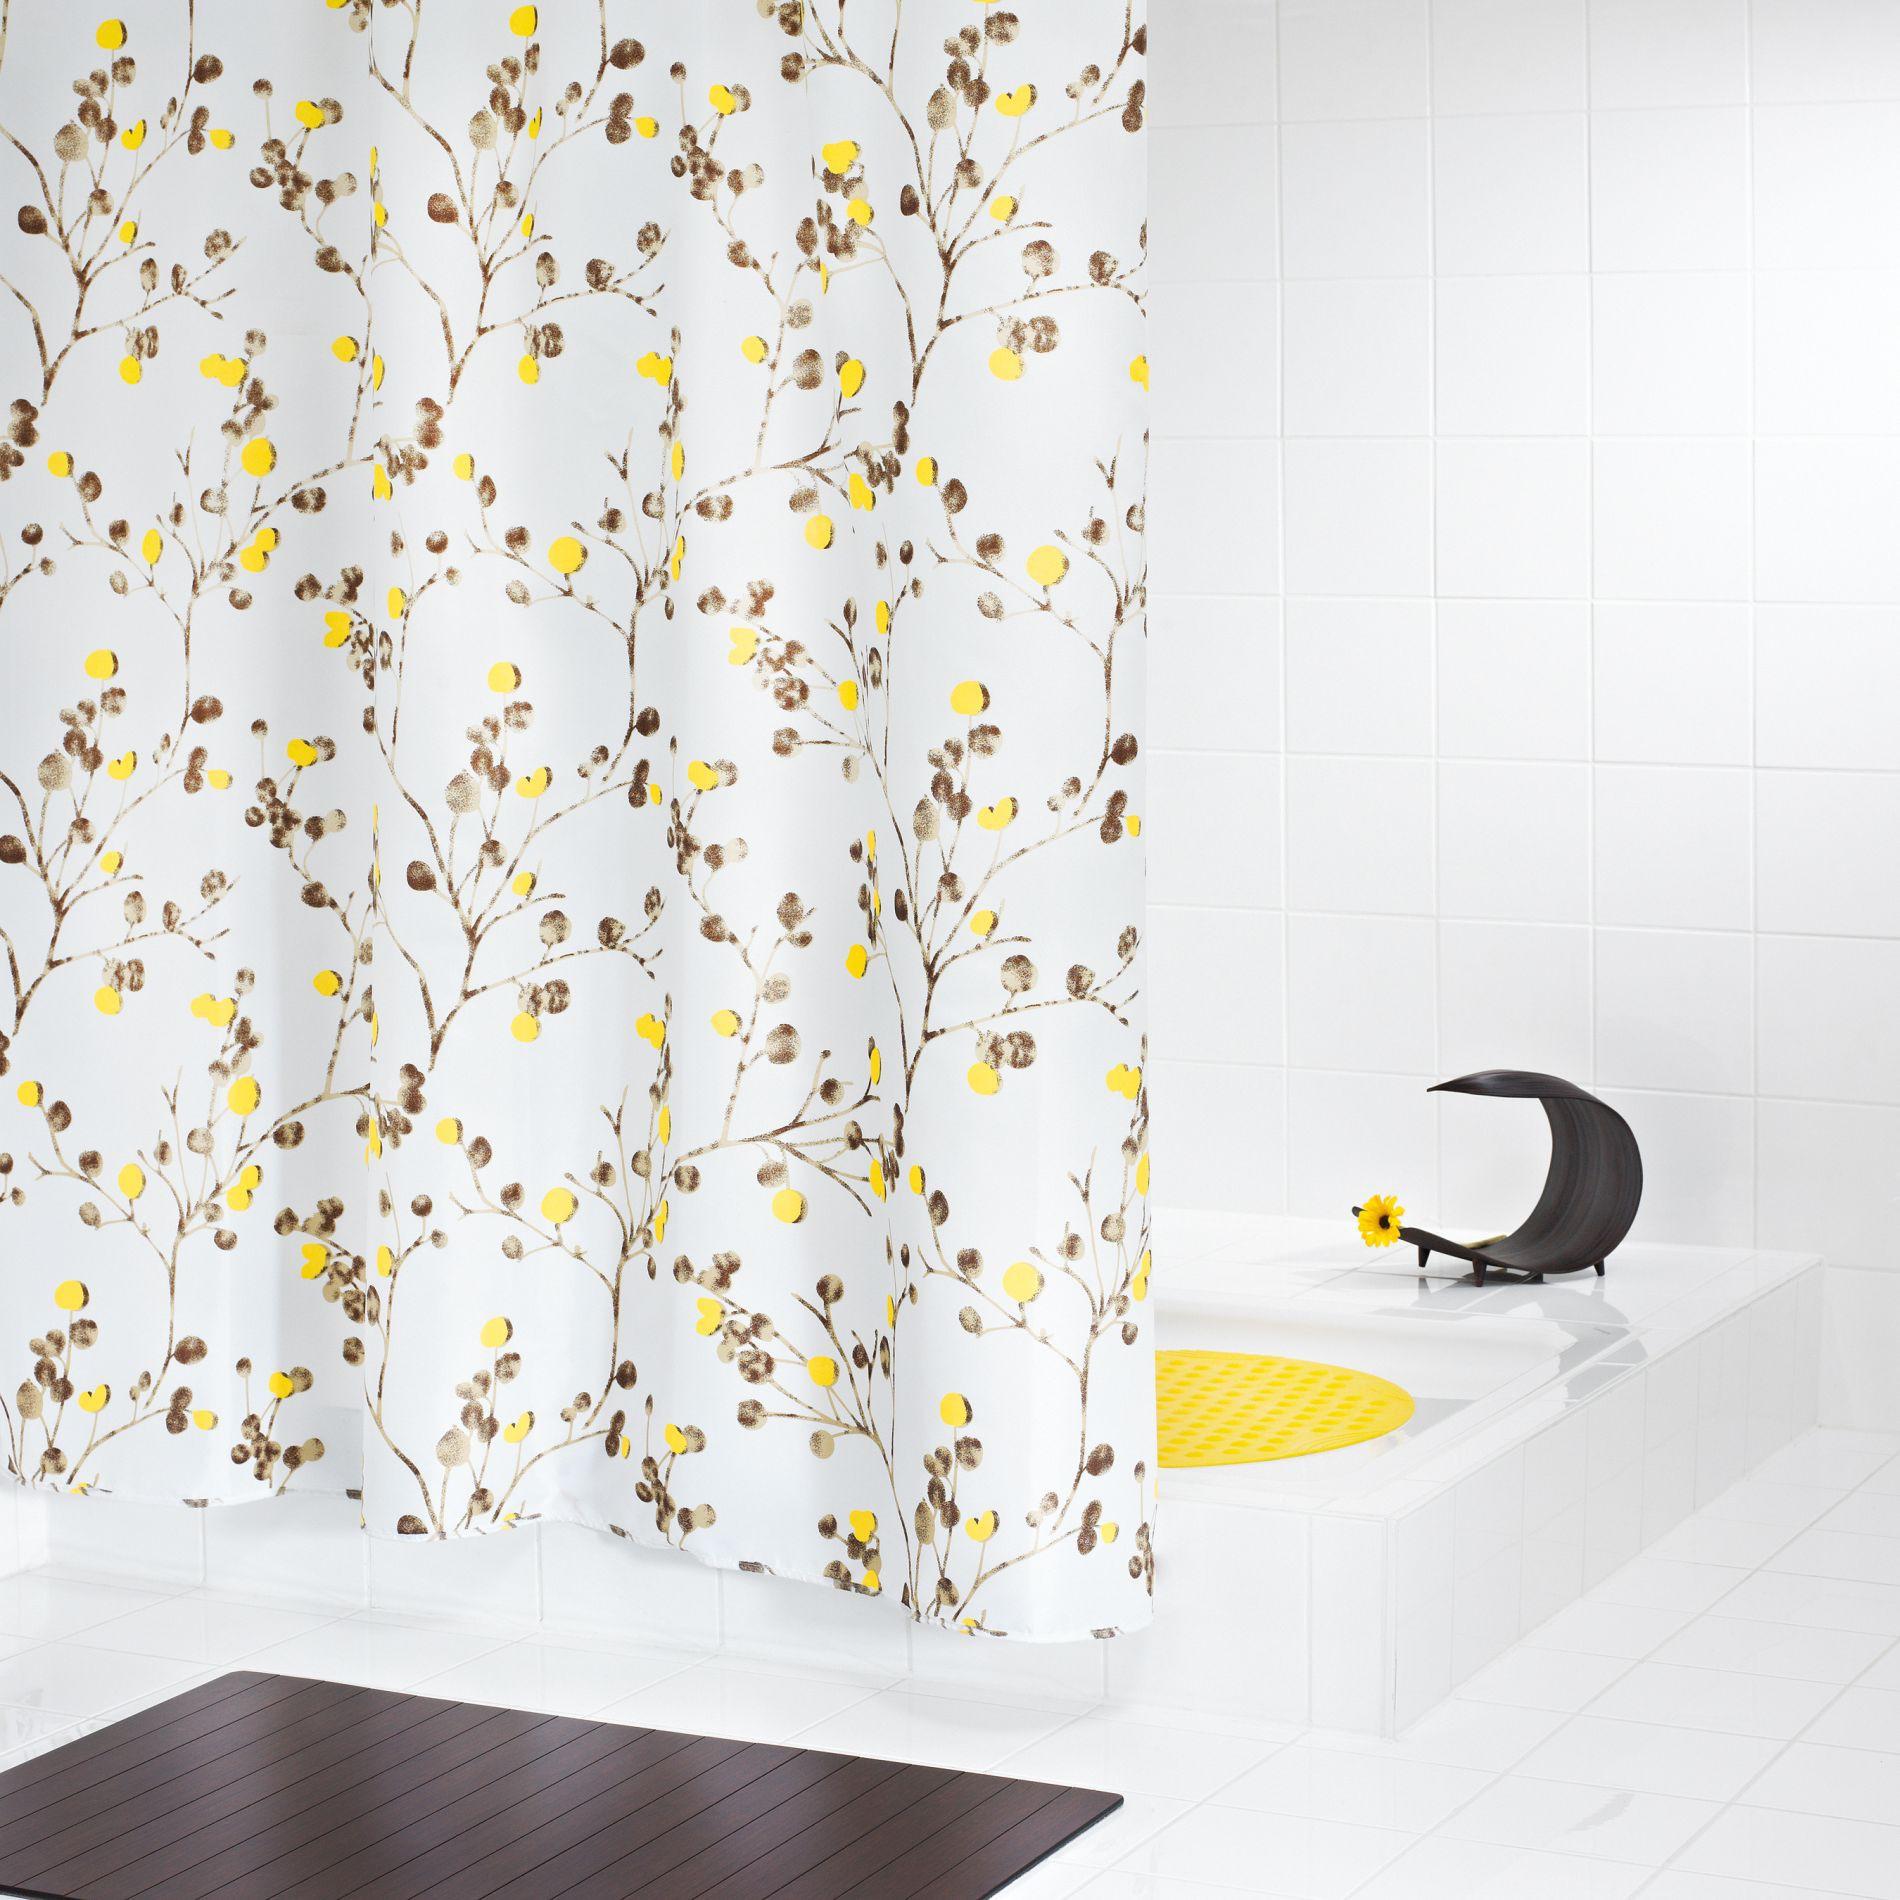 duschvorhang nach mass preisvergleiche. Black Bedroom Furniture Sets. Home Design Ideas